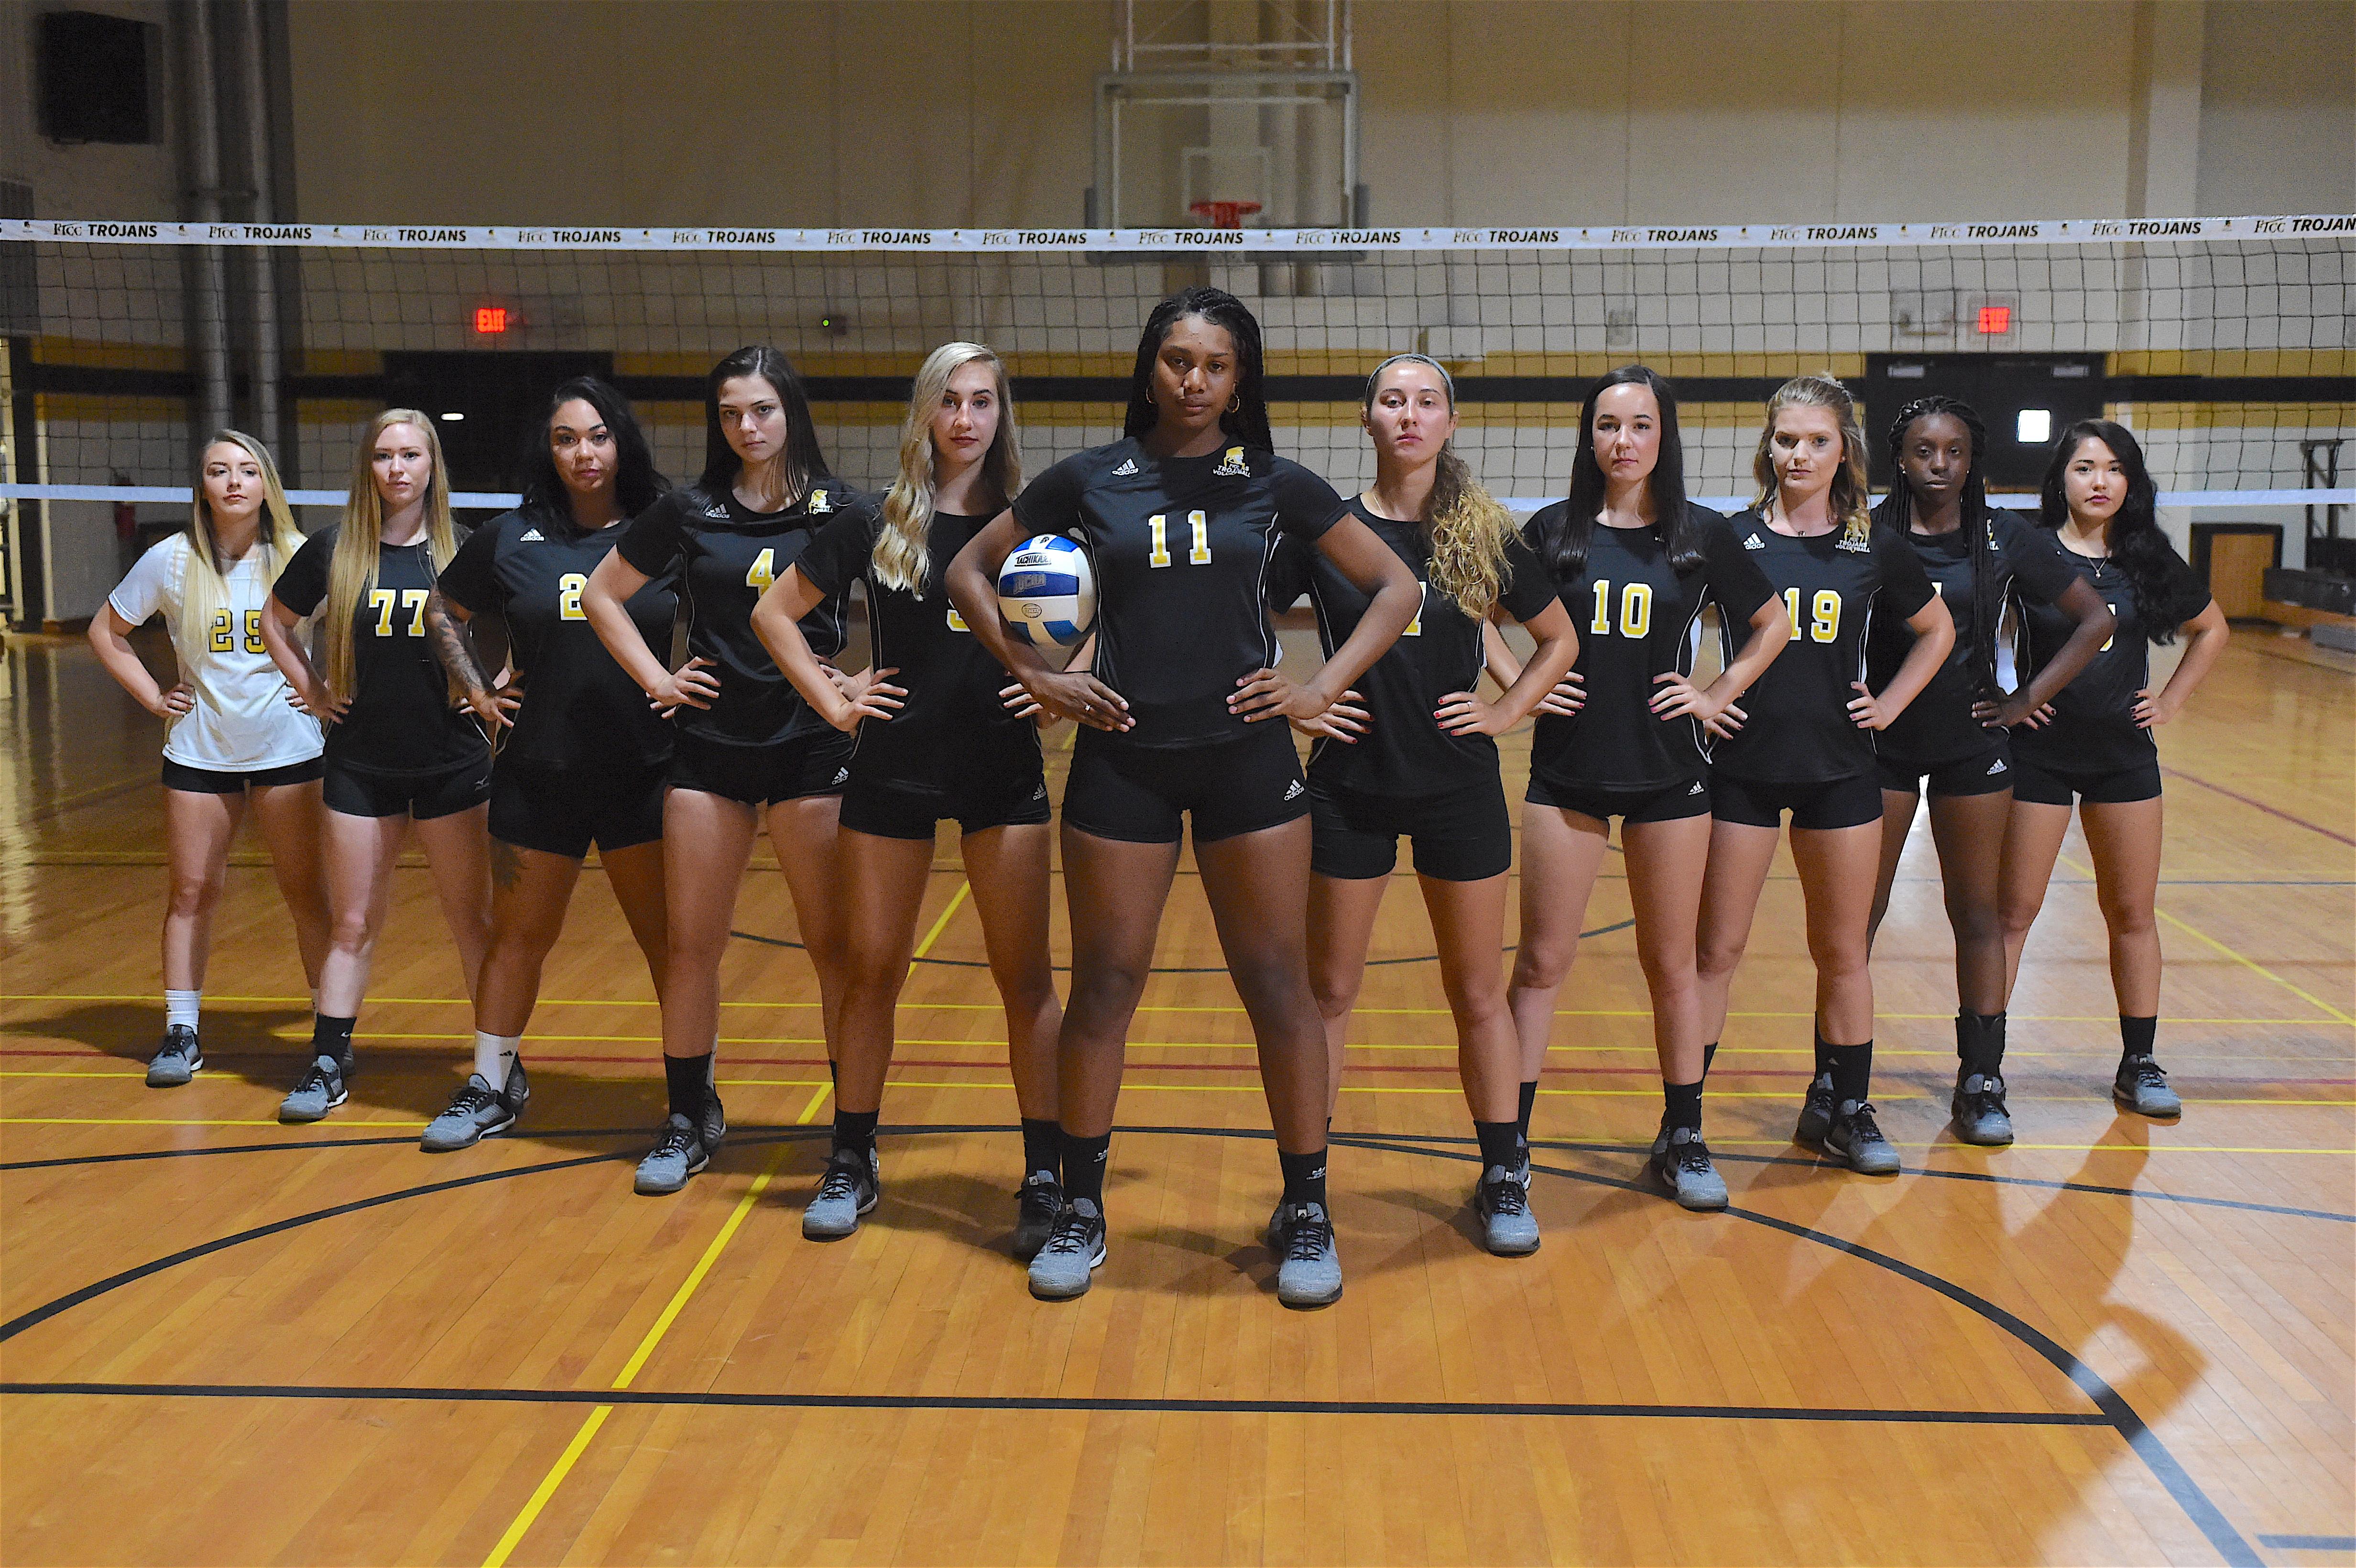 Volleyball team photo